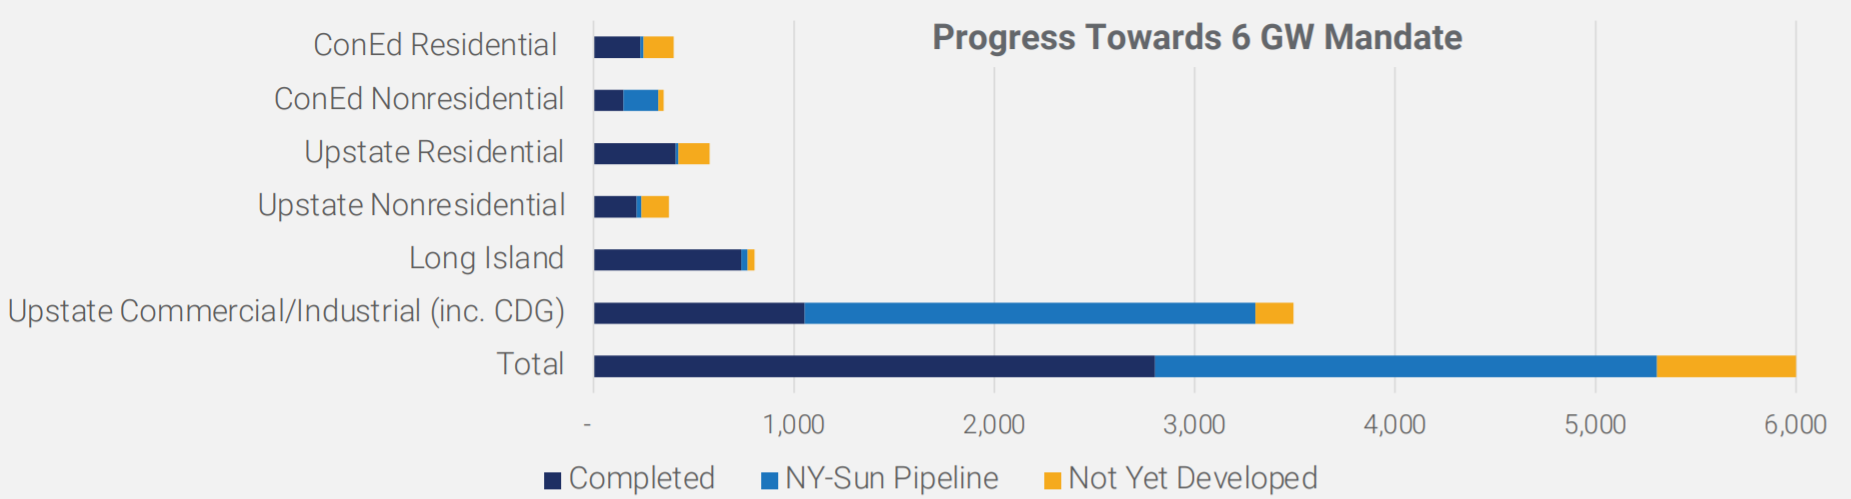 Progress Towards 6 GW Mandate